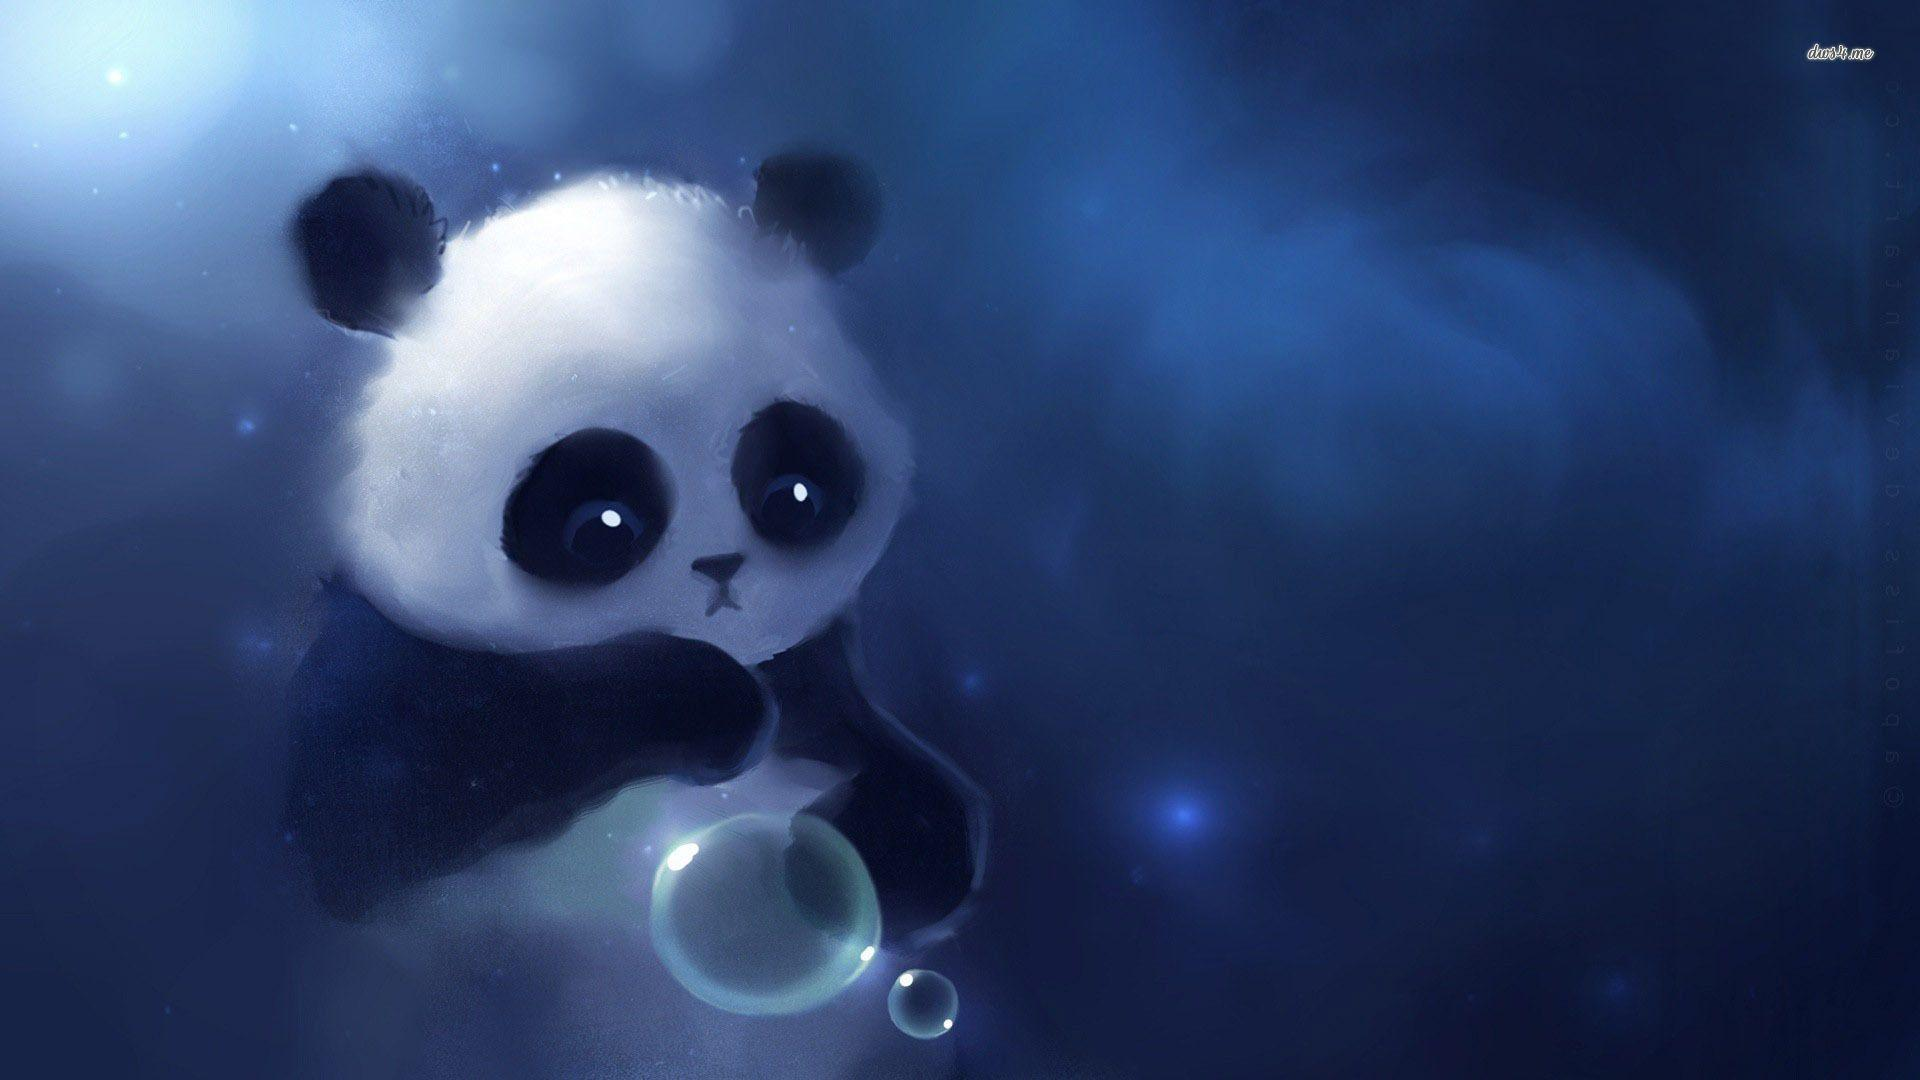 Kawaii Panda Wallpapers Wallpaper Cave